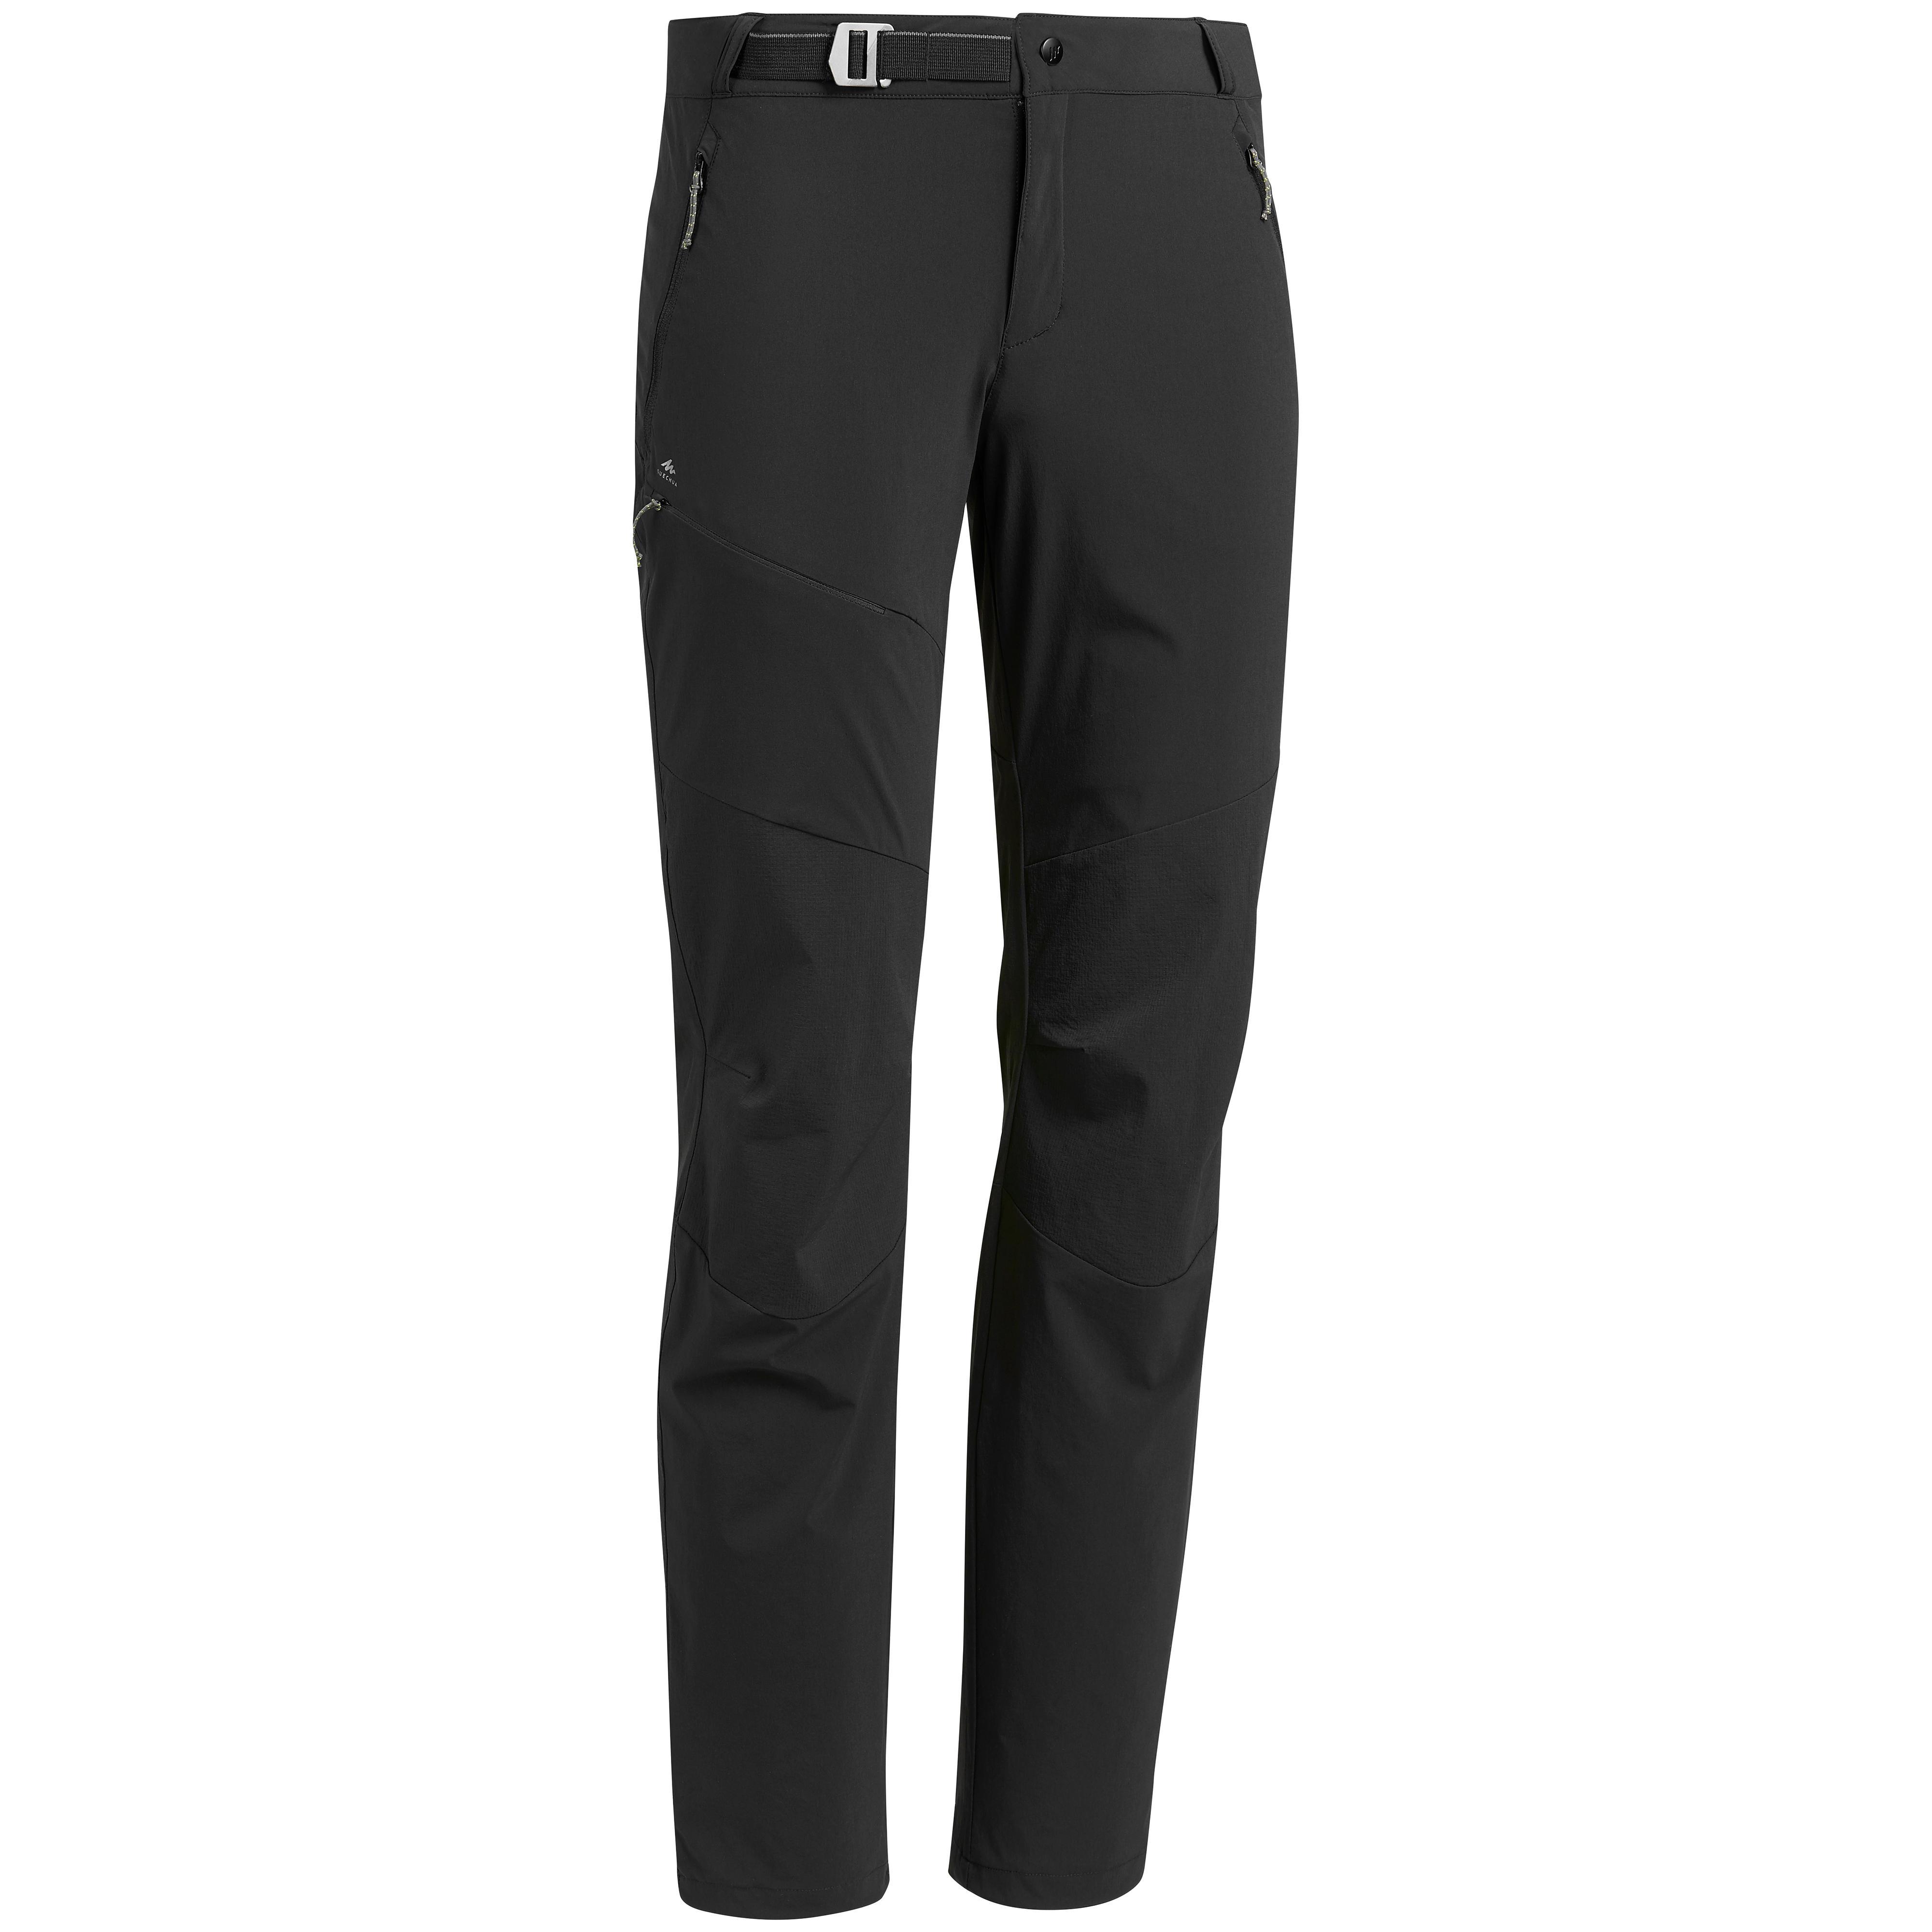 55a3237de23 Comprar Pantalones Deportivos para Hombre